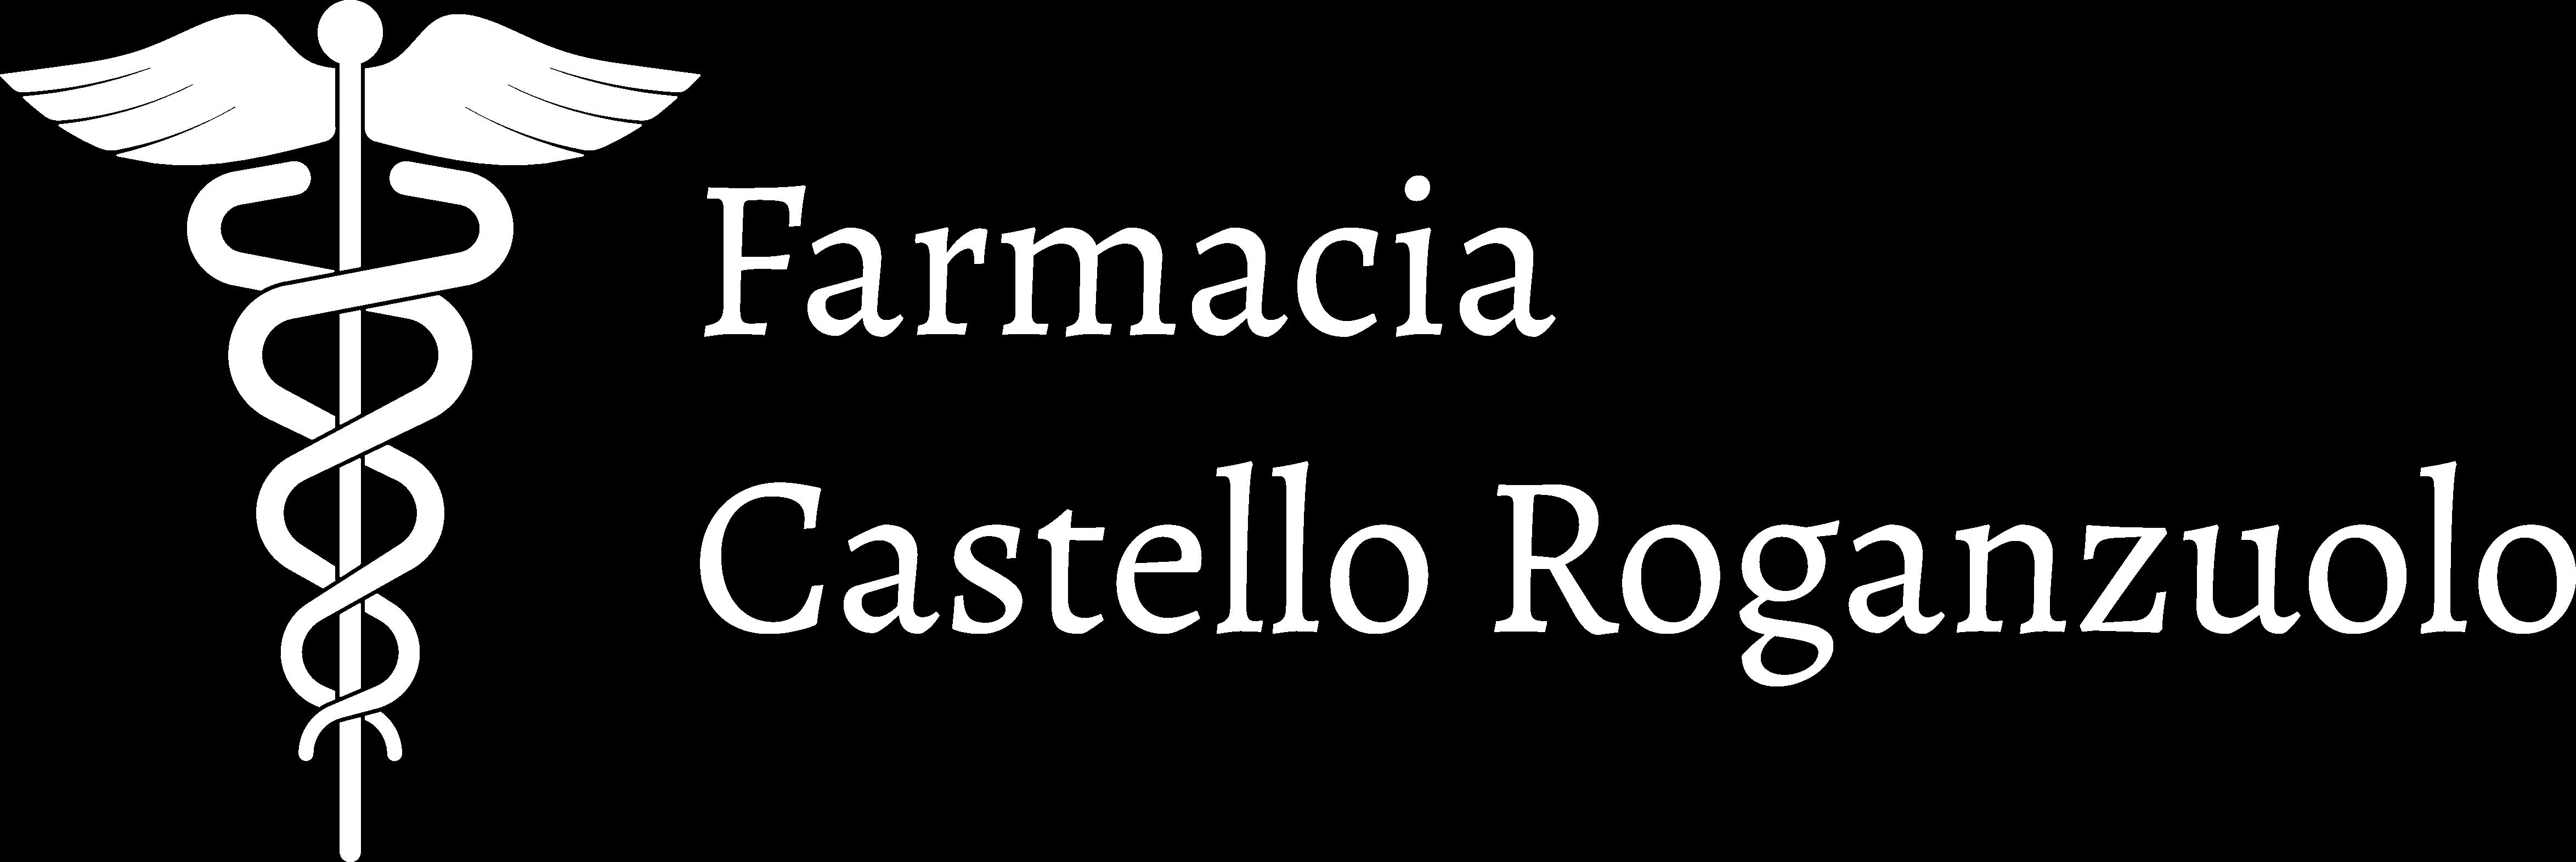 Farmacia Castello Roganzuolo